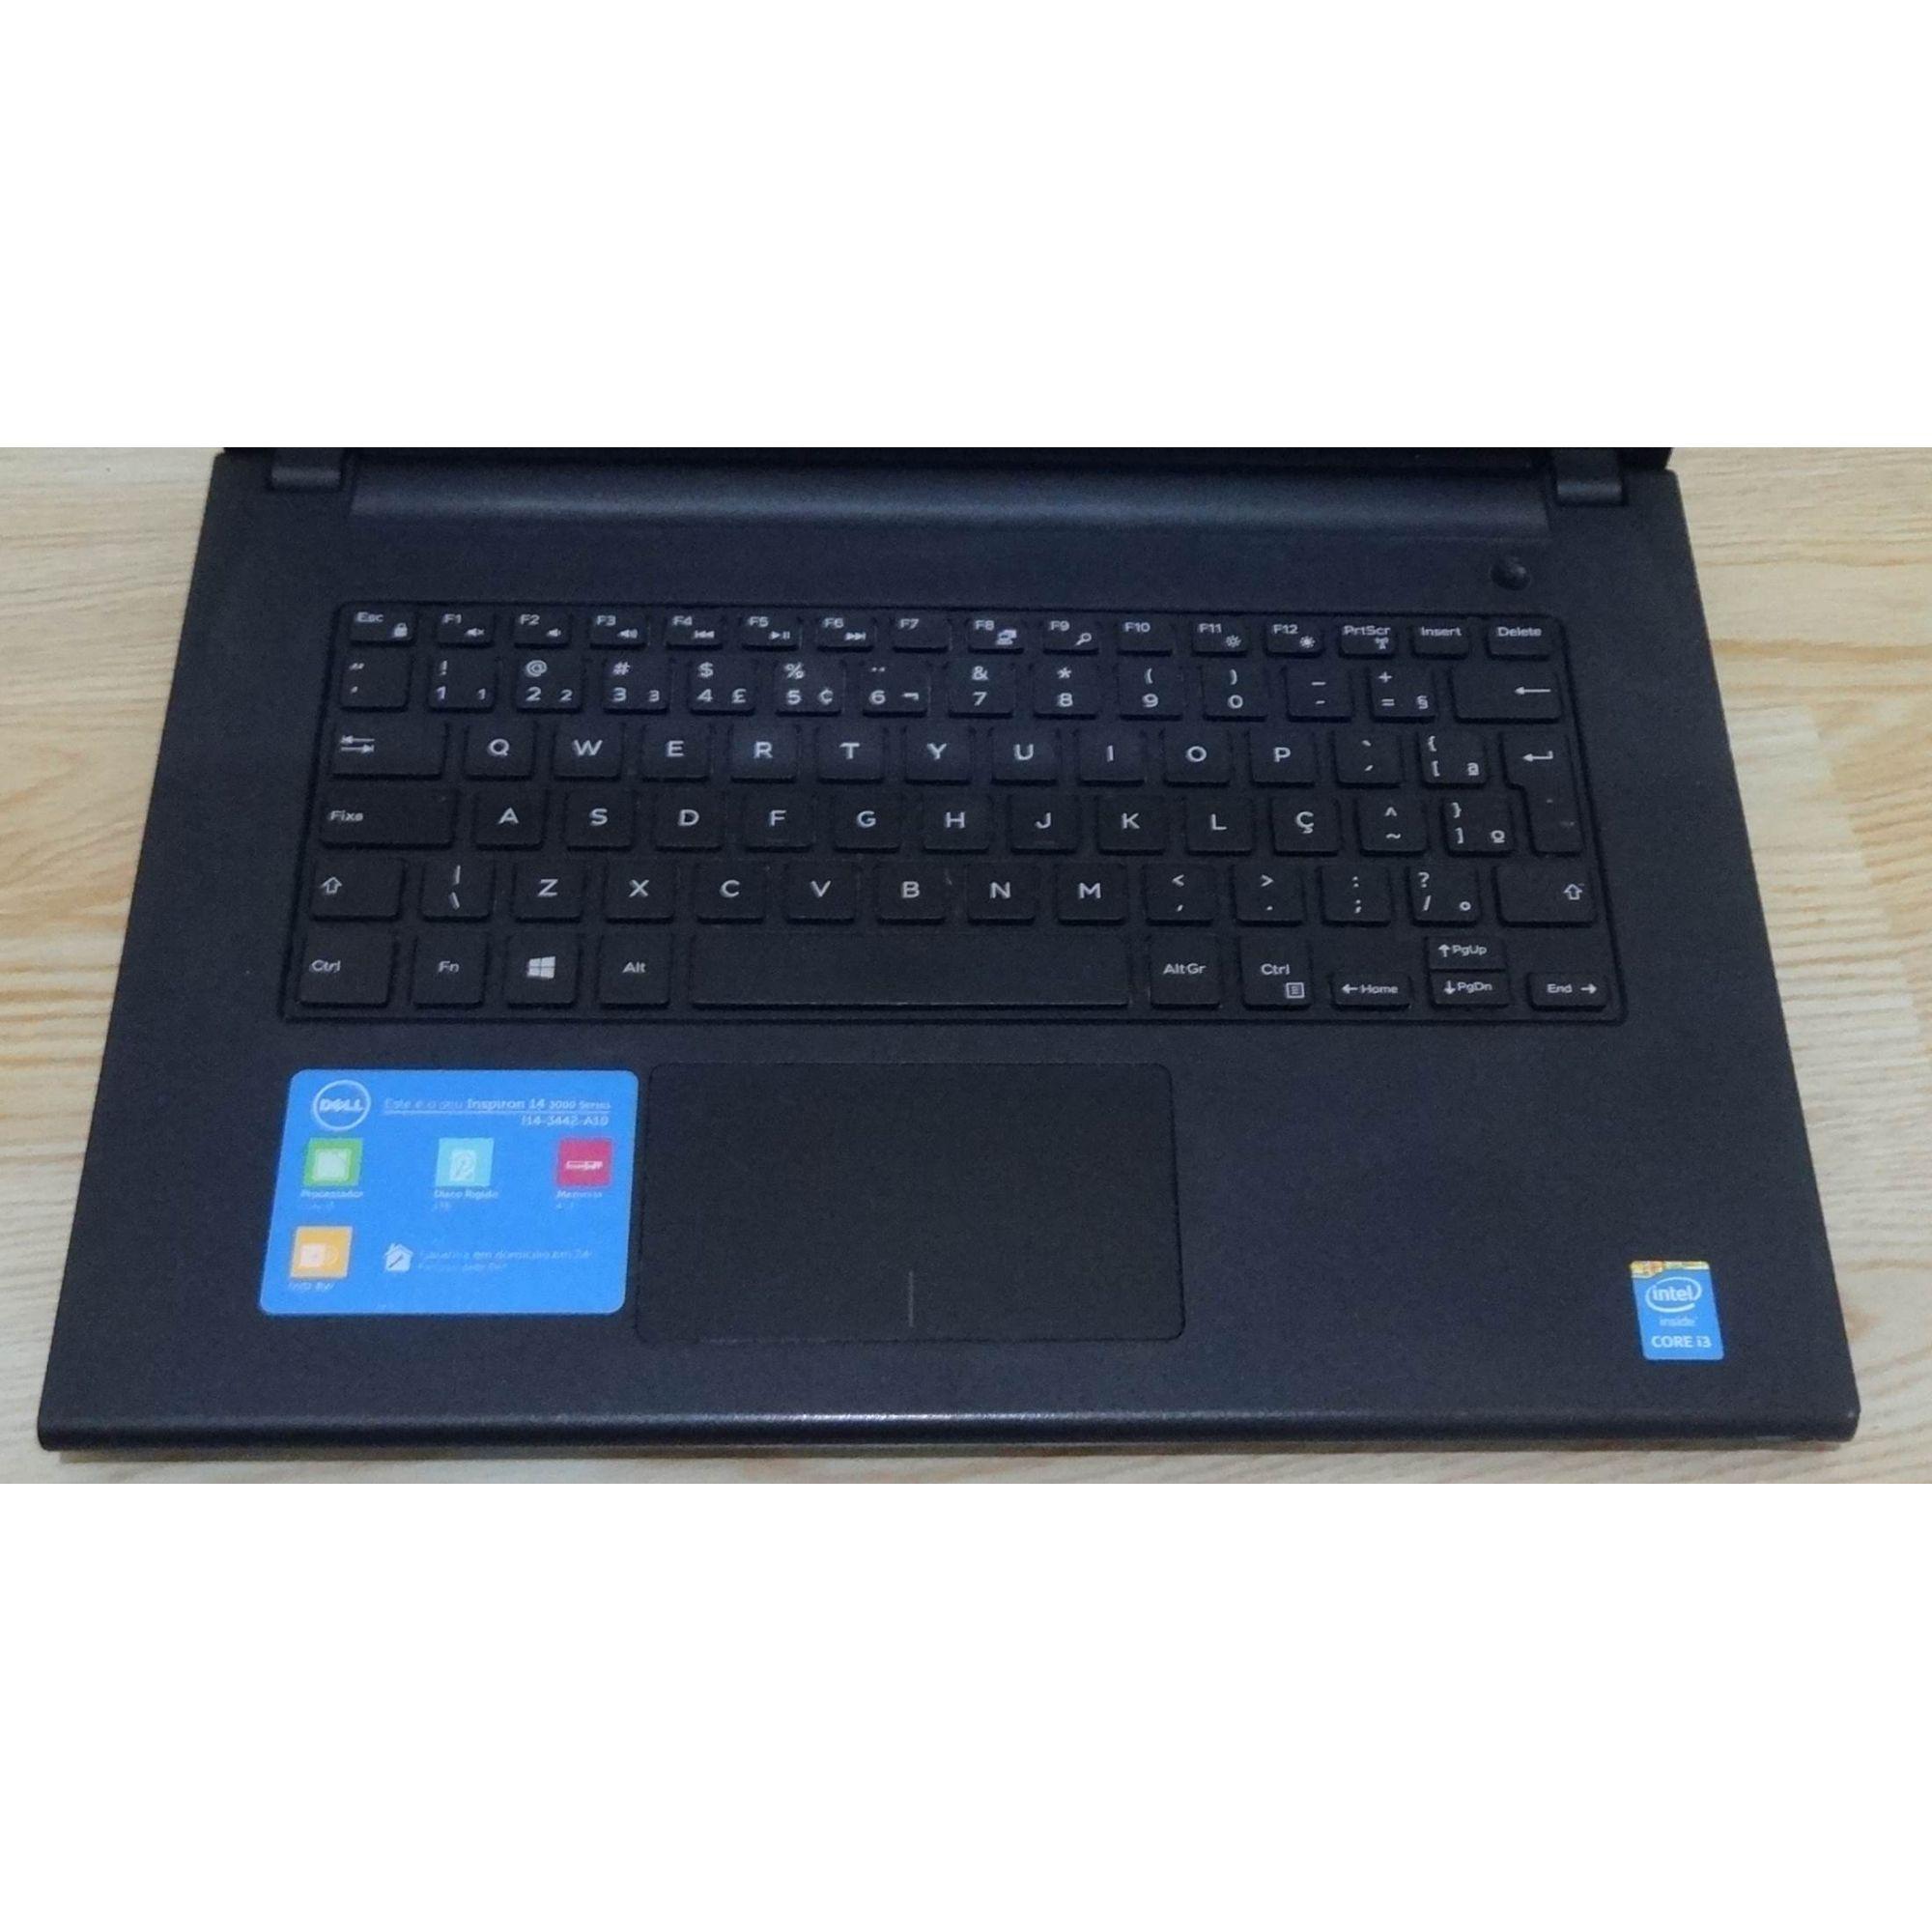 "Notebook Dell Inspiron 14-3442-A10 14"" Intel Core i3 1.7GHz 4GB 1TB HD (Não Enviamos)"